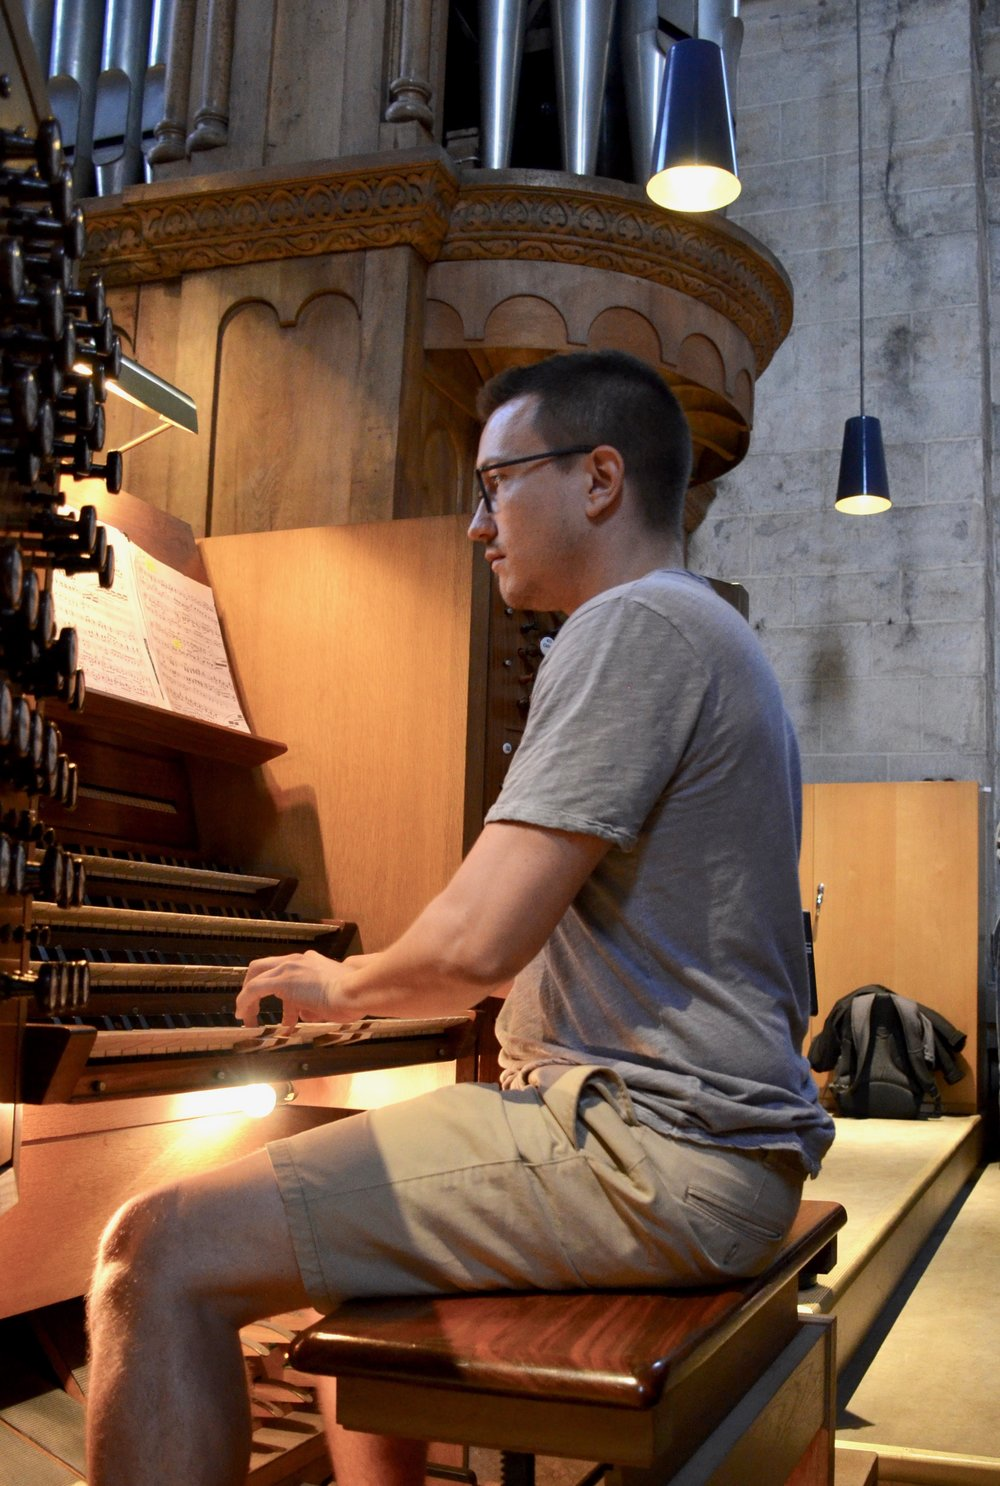 Corey De Tar plays the 1934 Marcussen organ in Lund Cathedral.